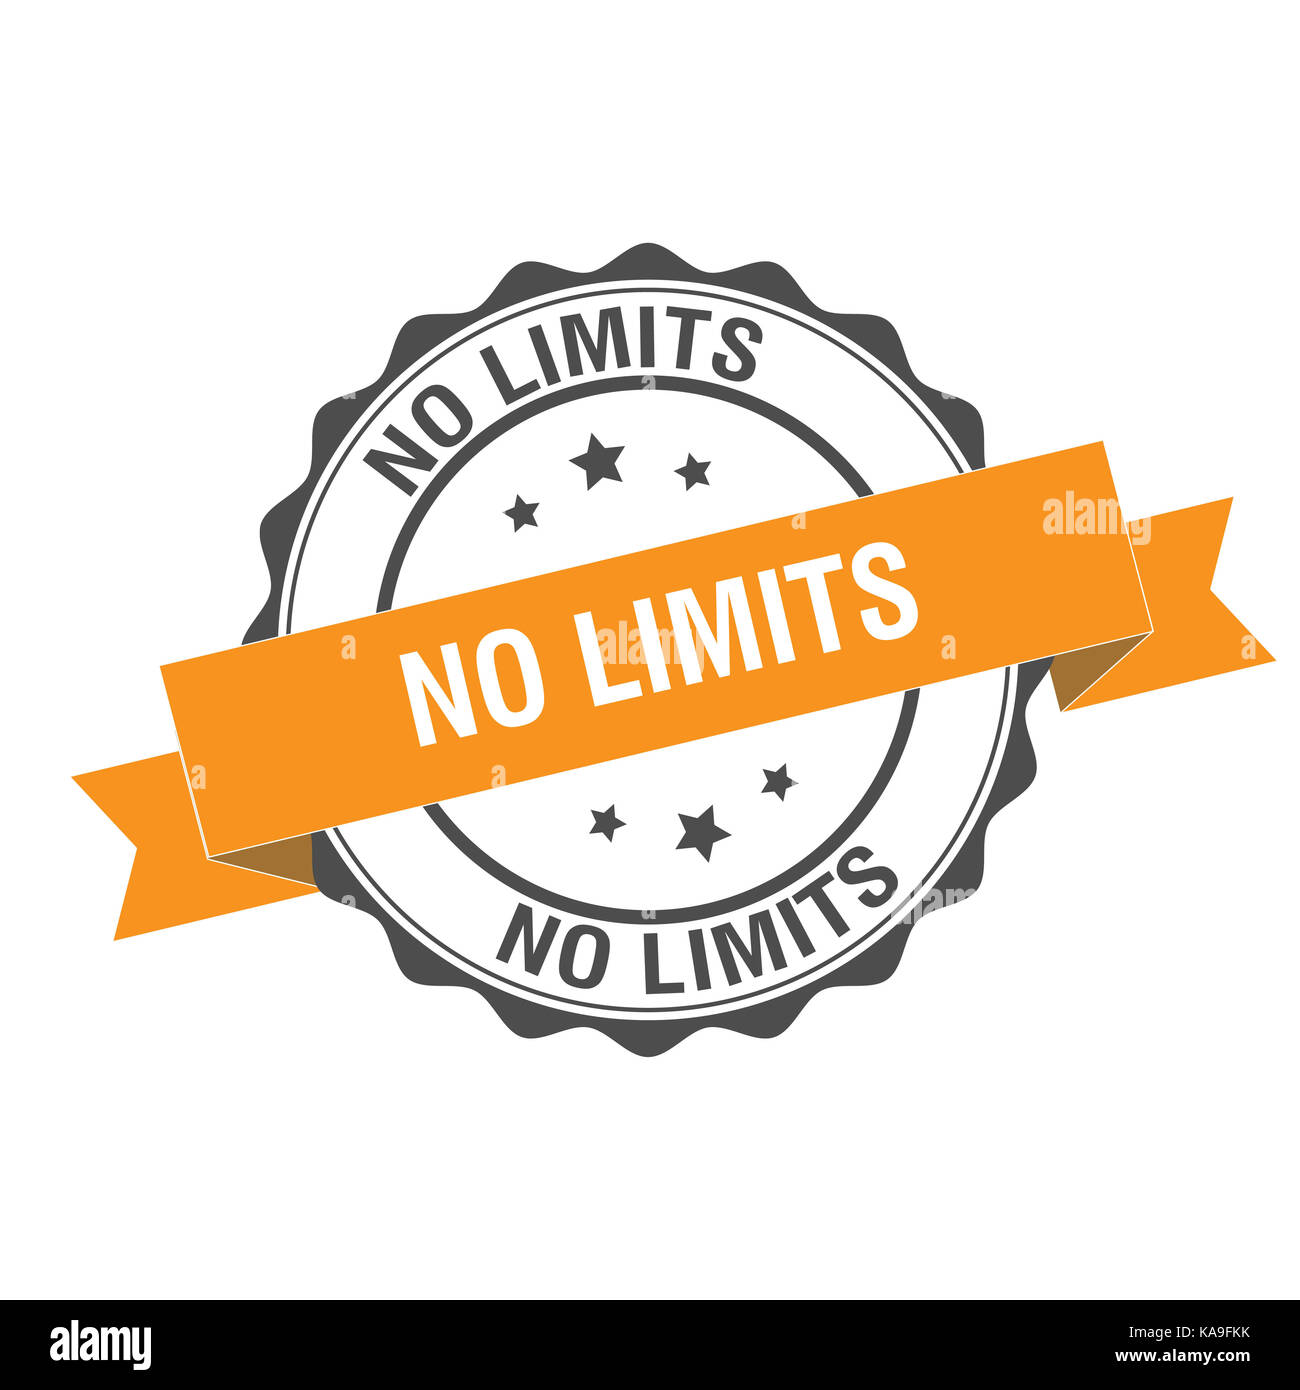 No limits stamp illustration - Stock Image